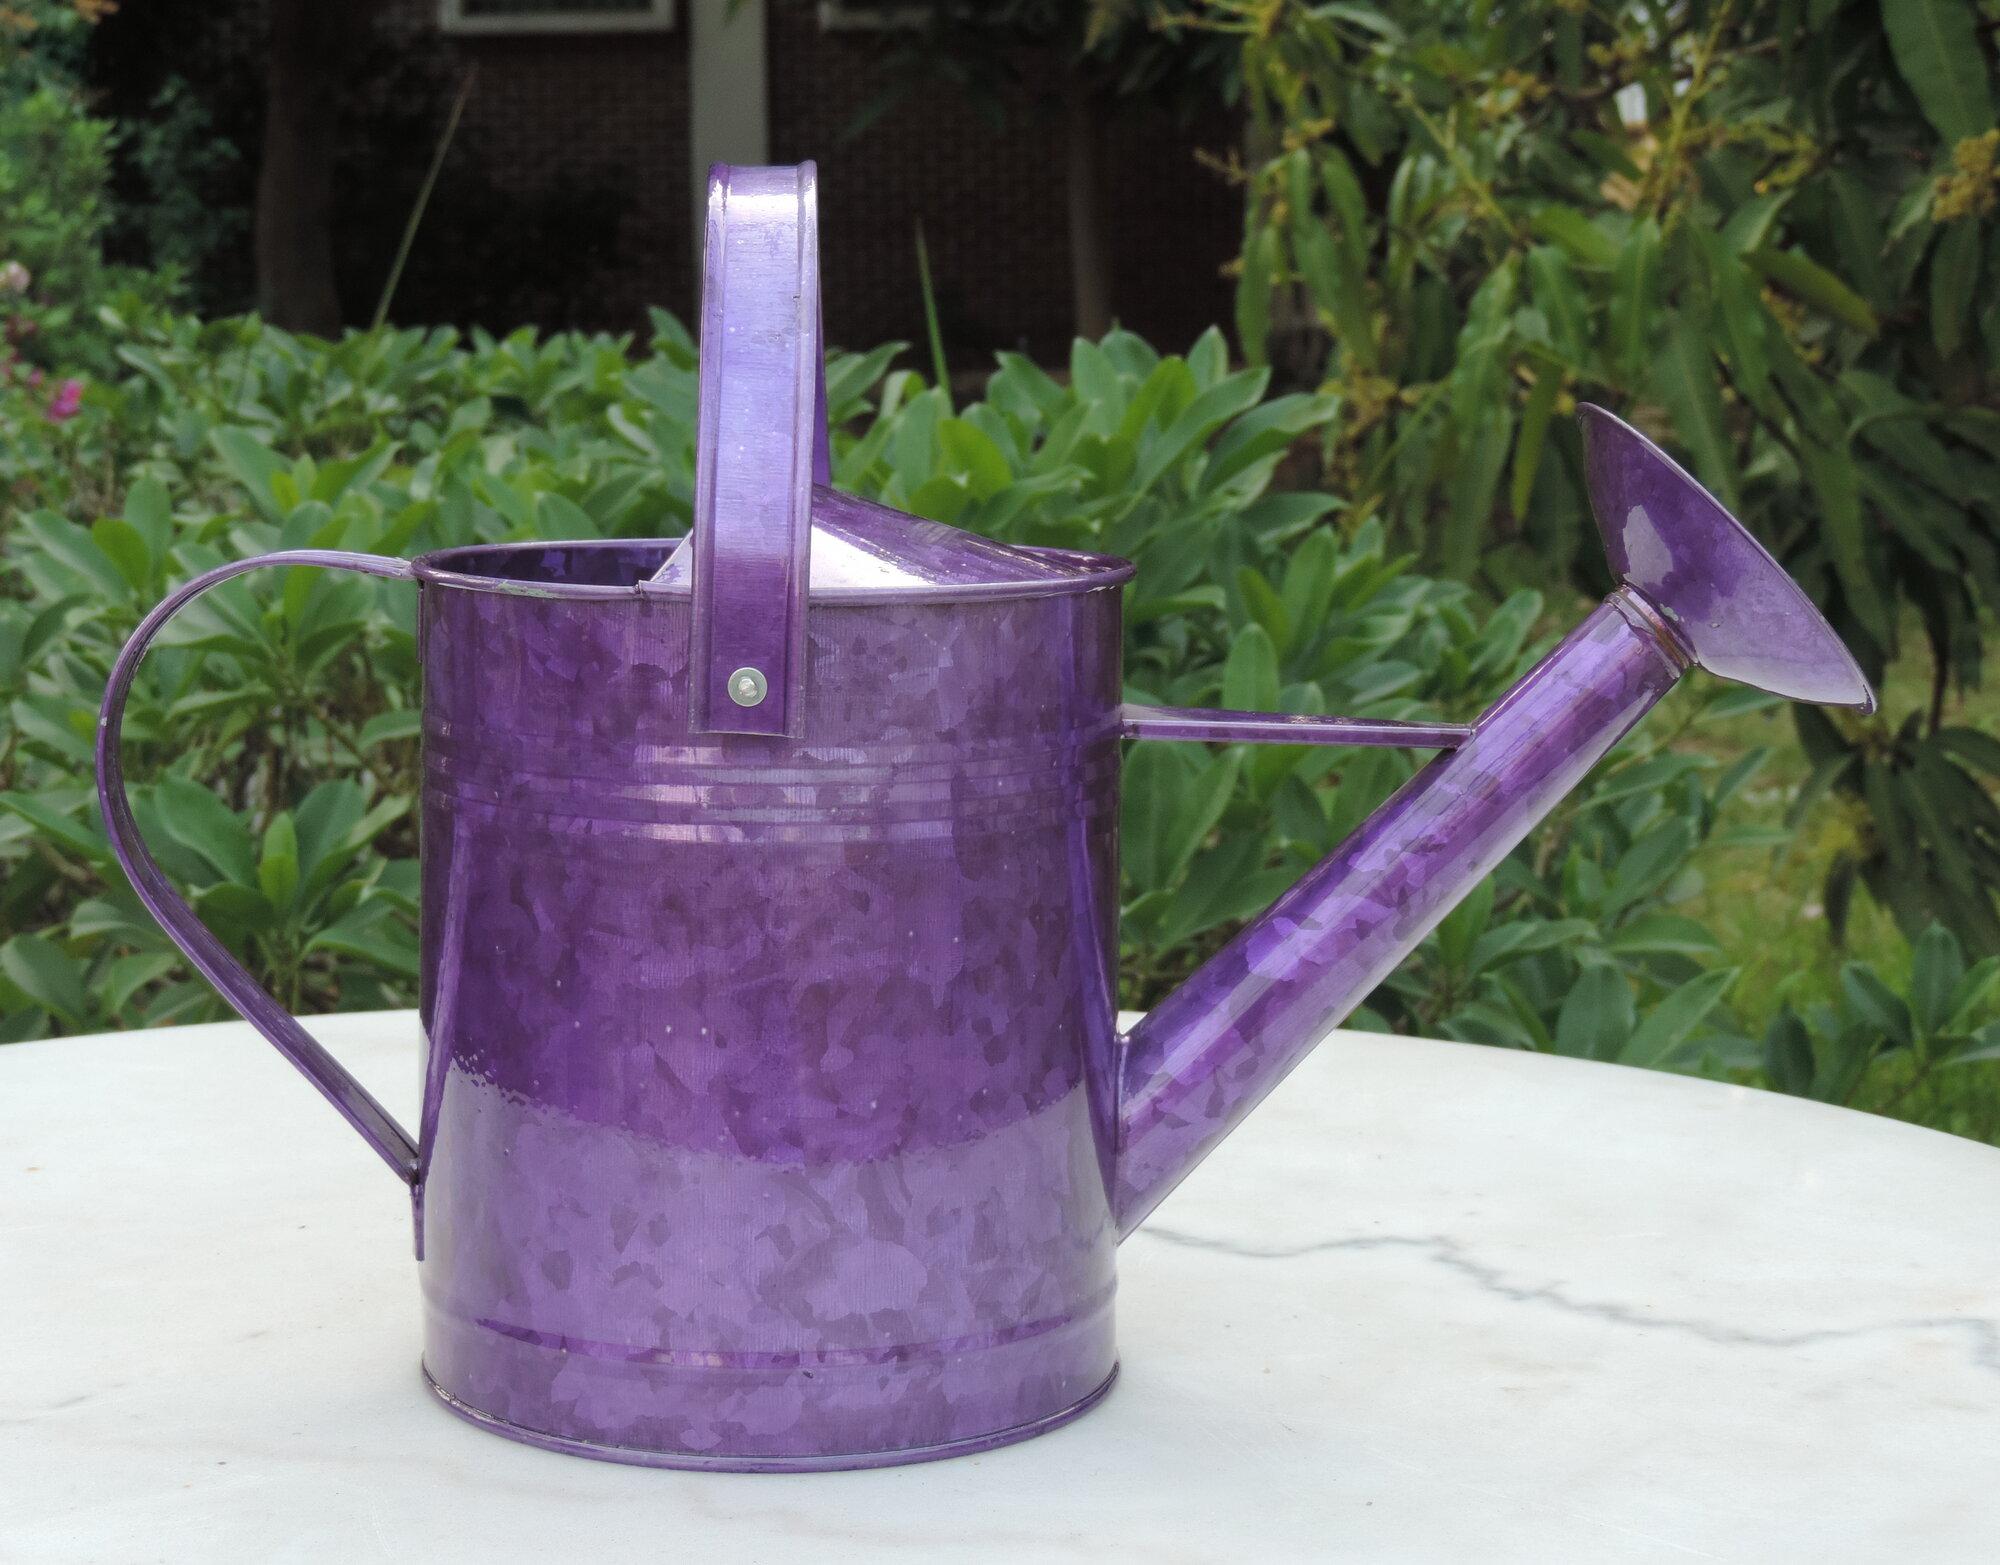 Griffith creek designs 1 gallon metal watering can ebay - Gallon metal watering can ...